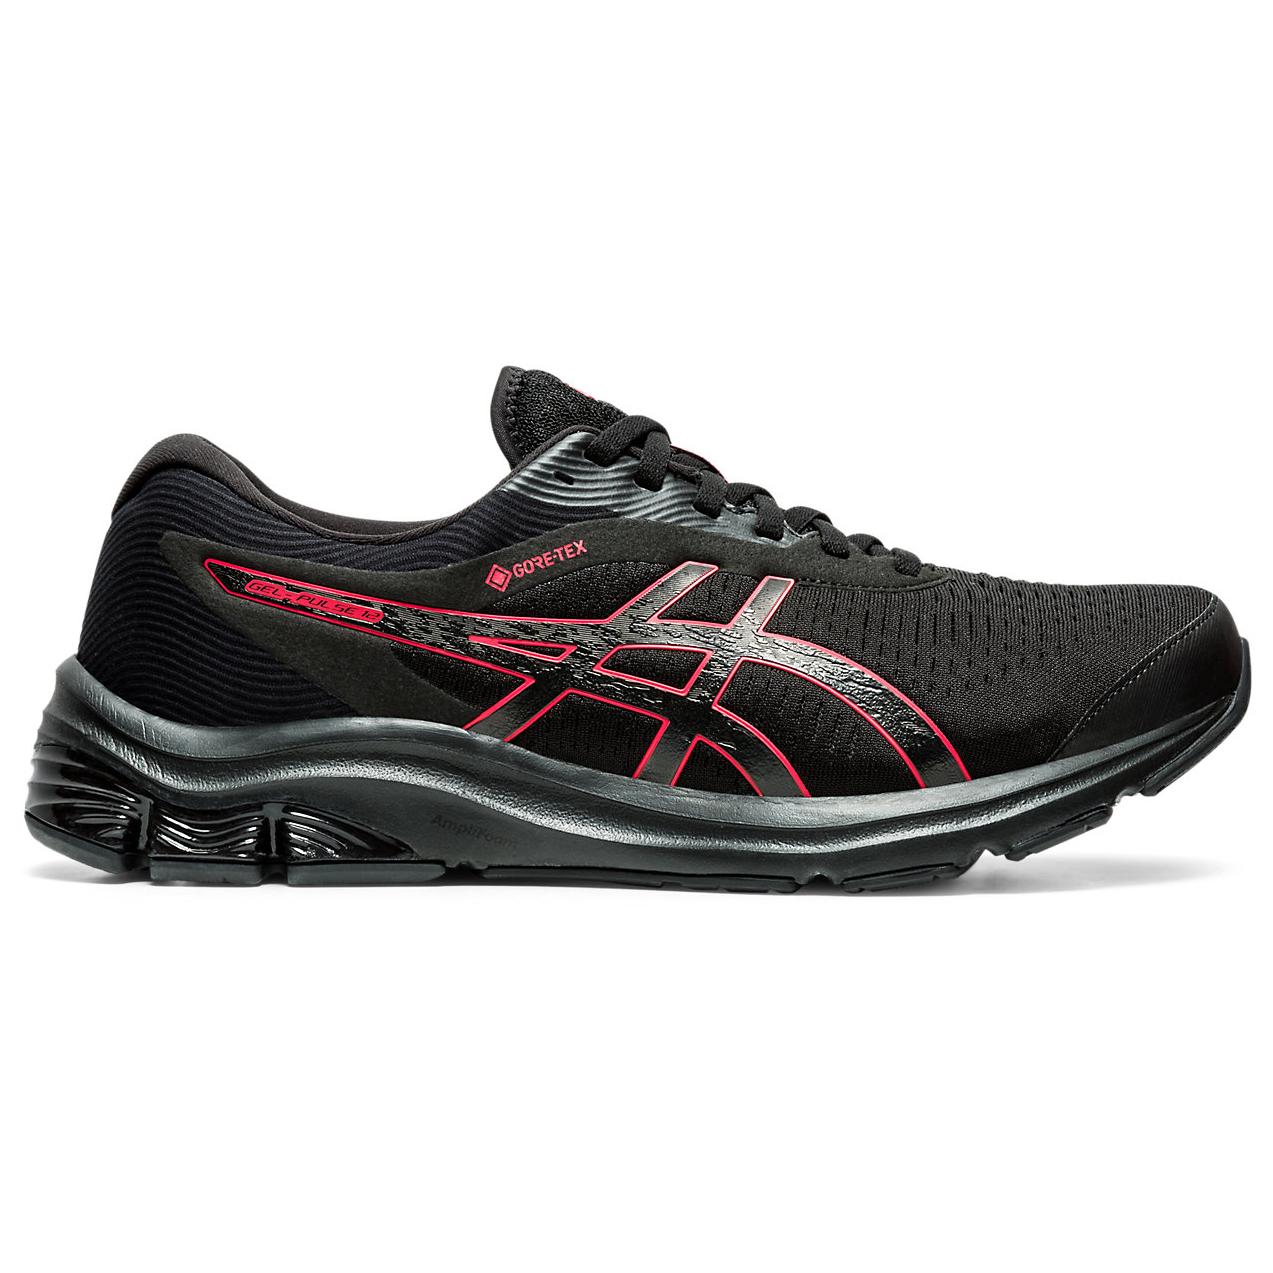 Asics - Gel-Pulse 12 GTX - Running shoes - Black / Black | 8 (US)